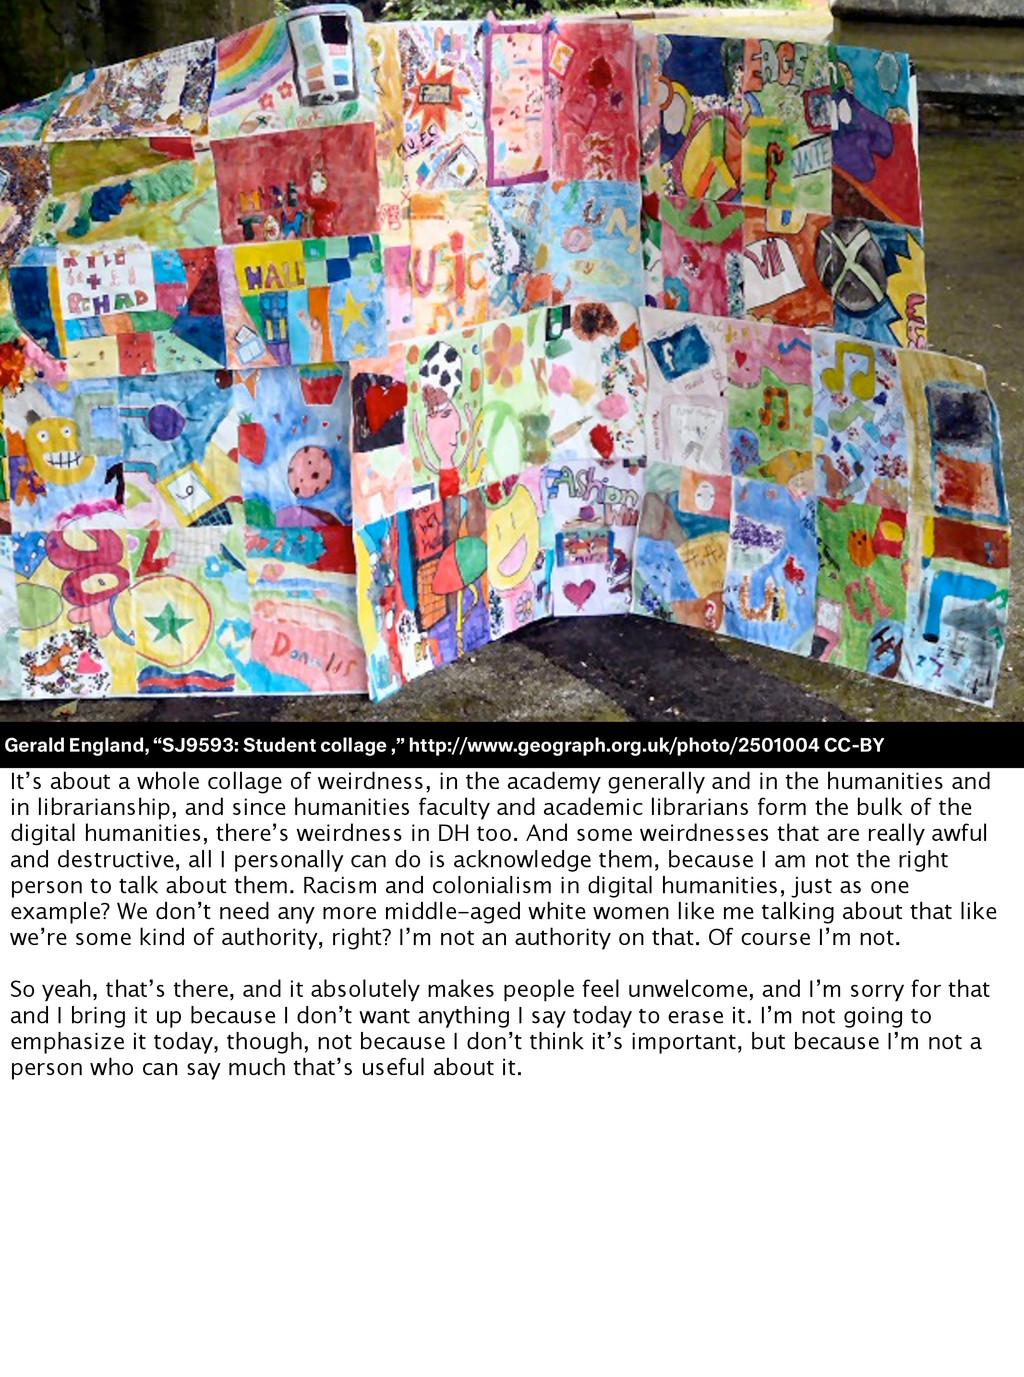 "Gerald England, ""SJ9593: Student collage ,"" htt..."